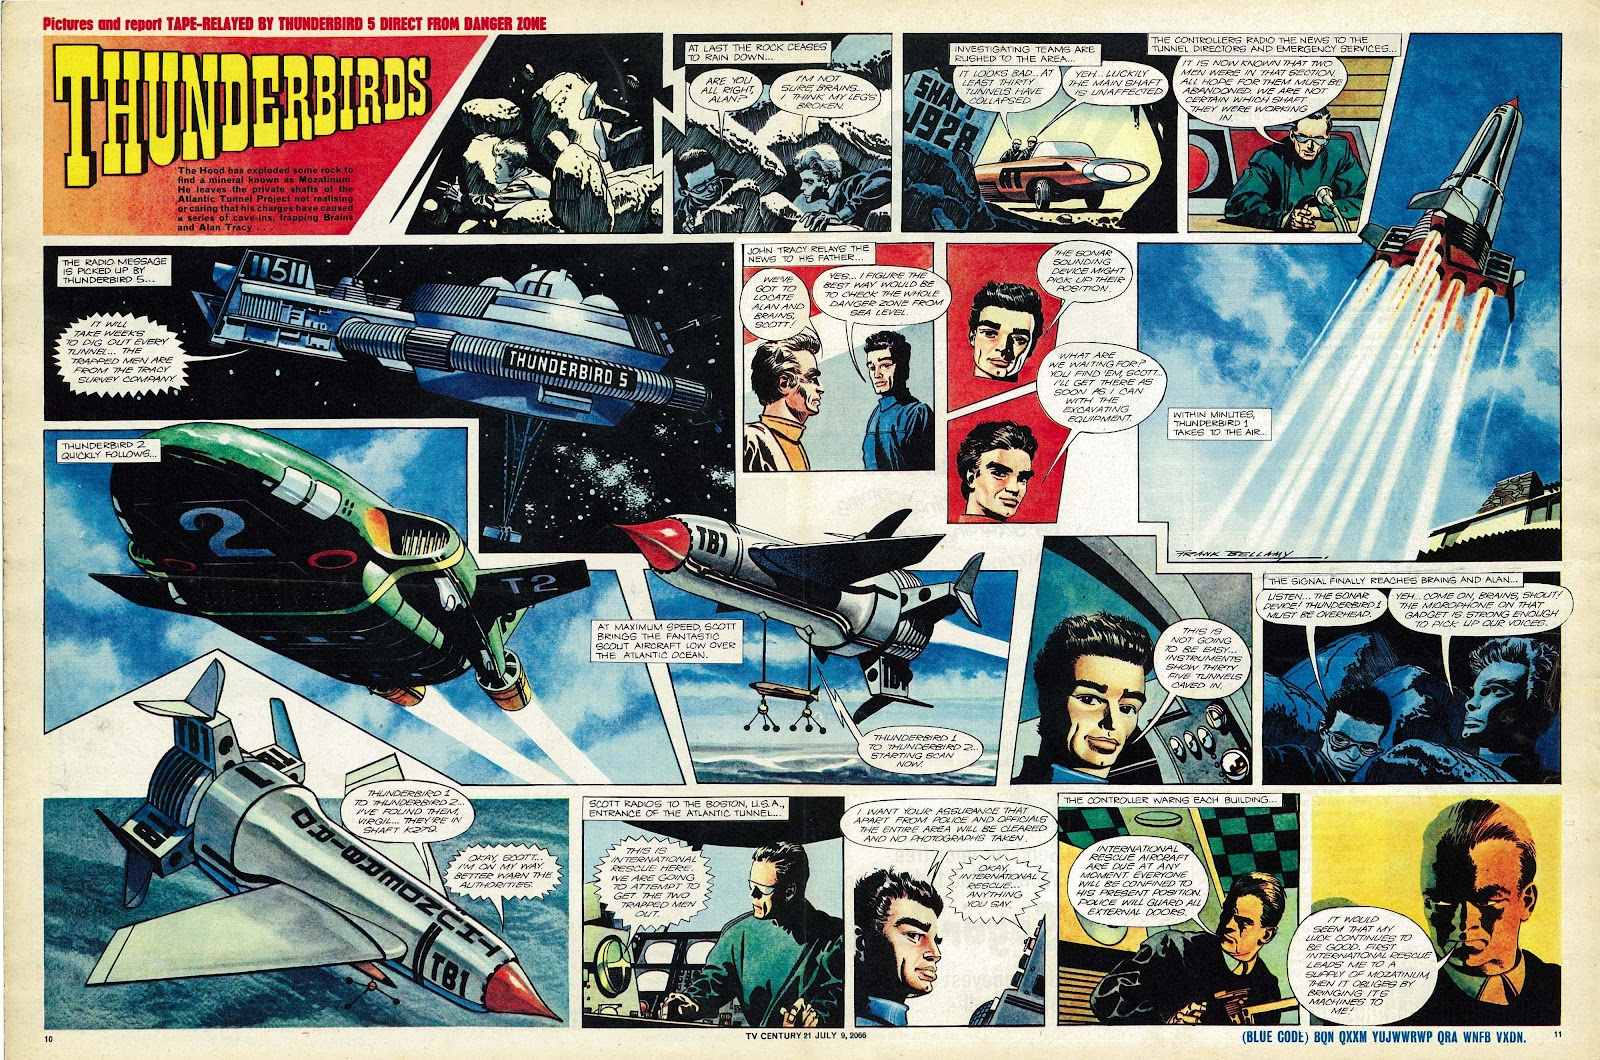 TV Century 21 (TV 21) issue 77 - Page 10